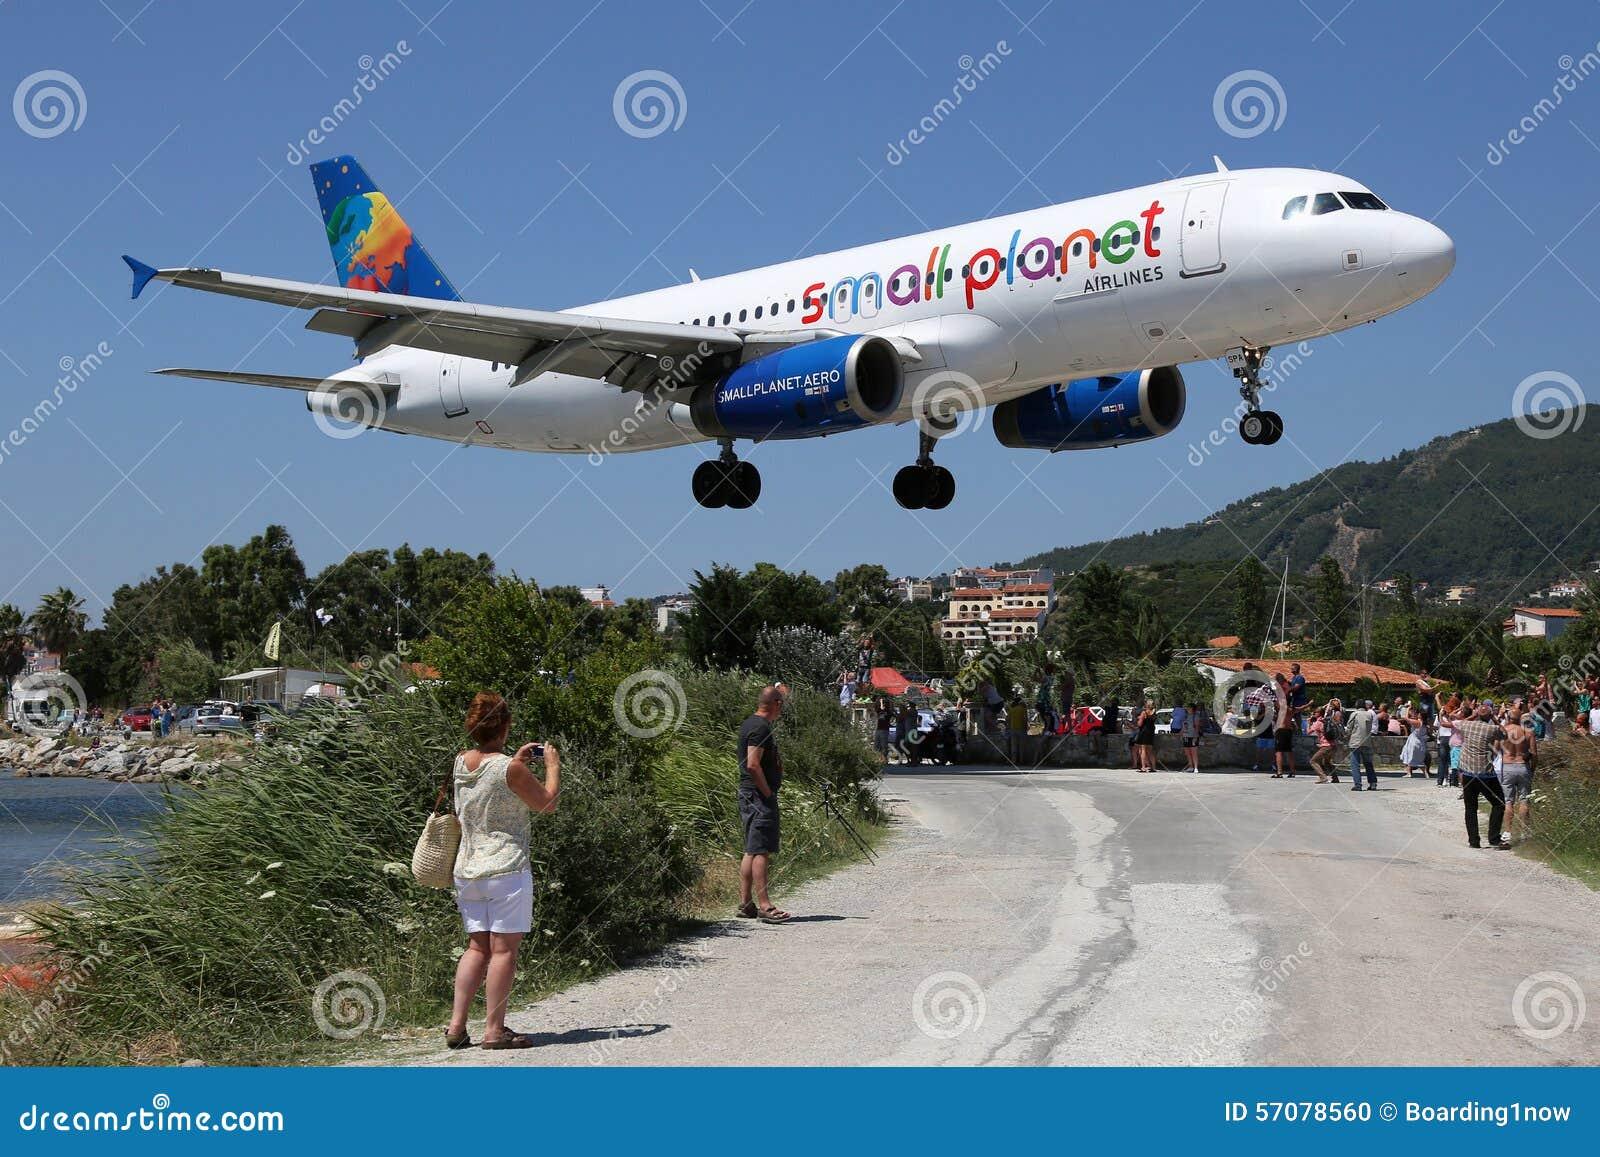 Aeroporto Skiathos : Piccolo aeroporto di skiathos dell aeroplano airbus